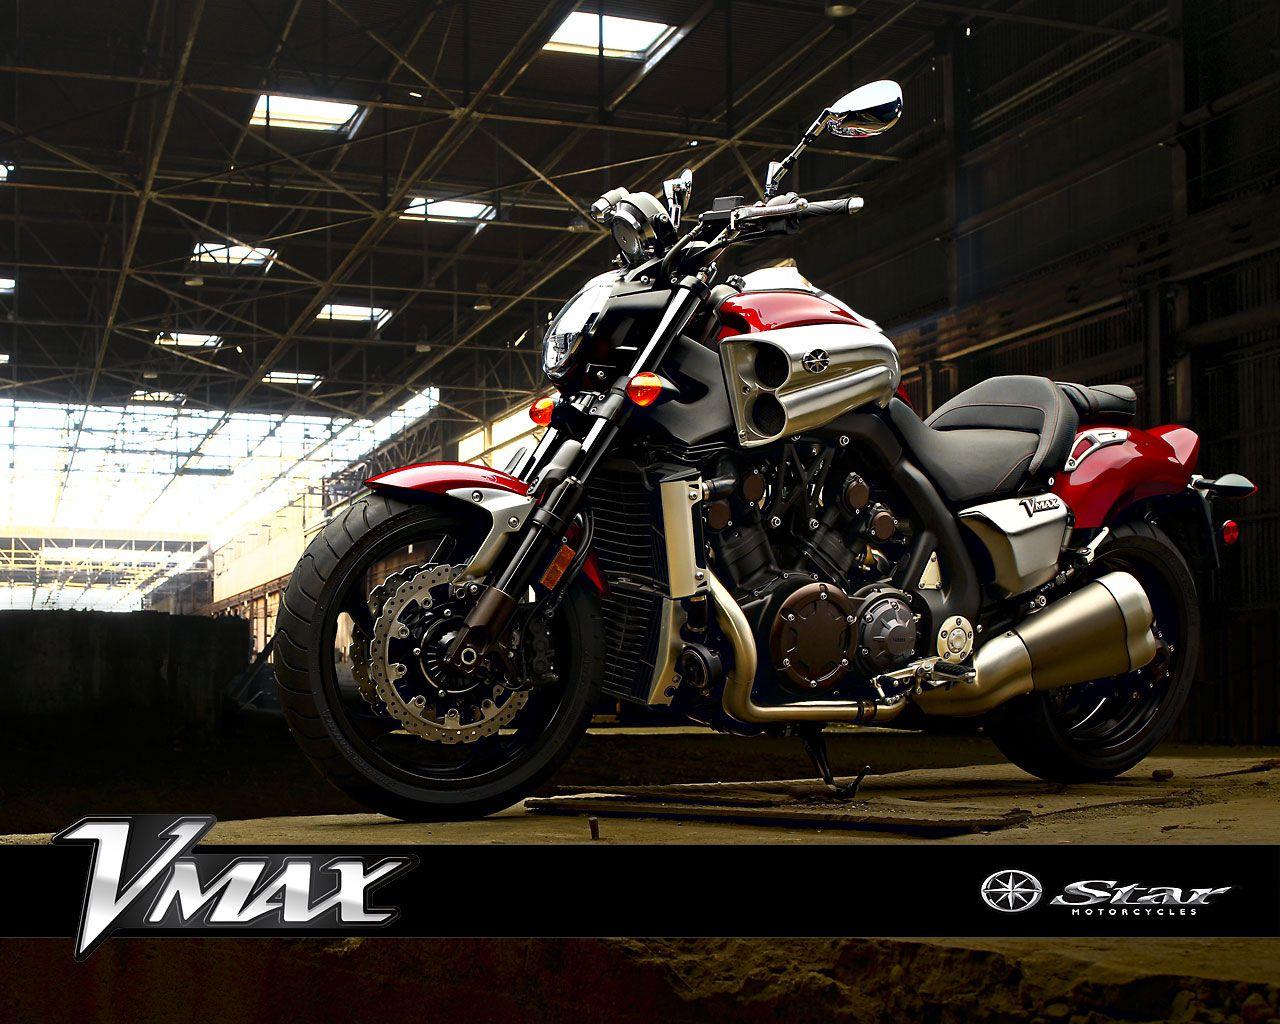 ... manual Array - yamaha vmax google search vehicles pinterest vehicle rh  pinterest com